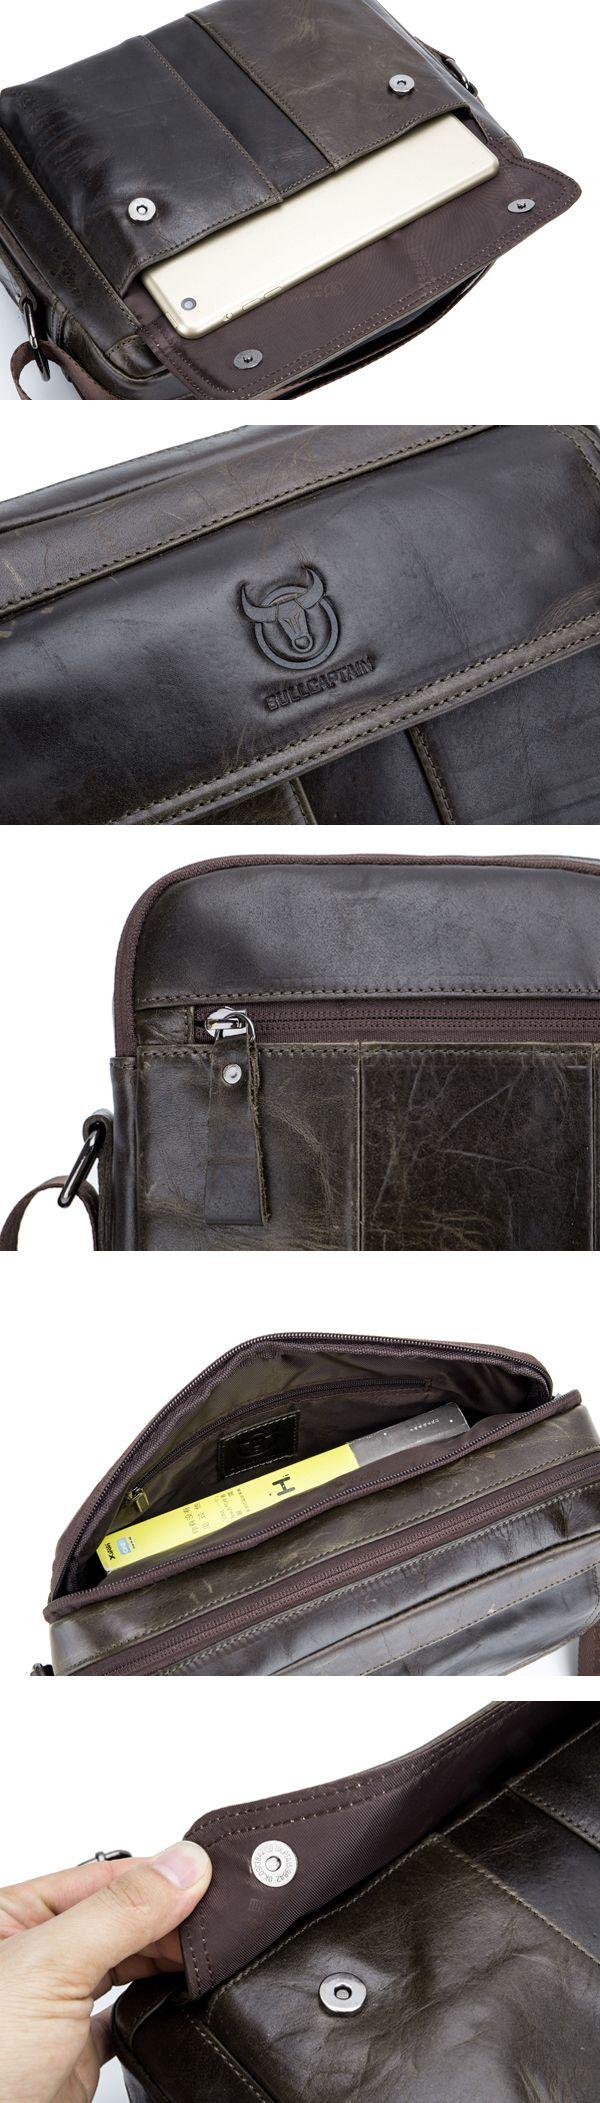 Bullcaptain® Men Genuine Leather Crossbody Shoulder Bag Business Messenger Bag Coffee Brown